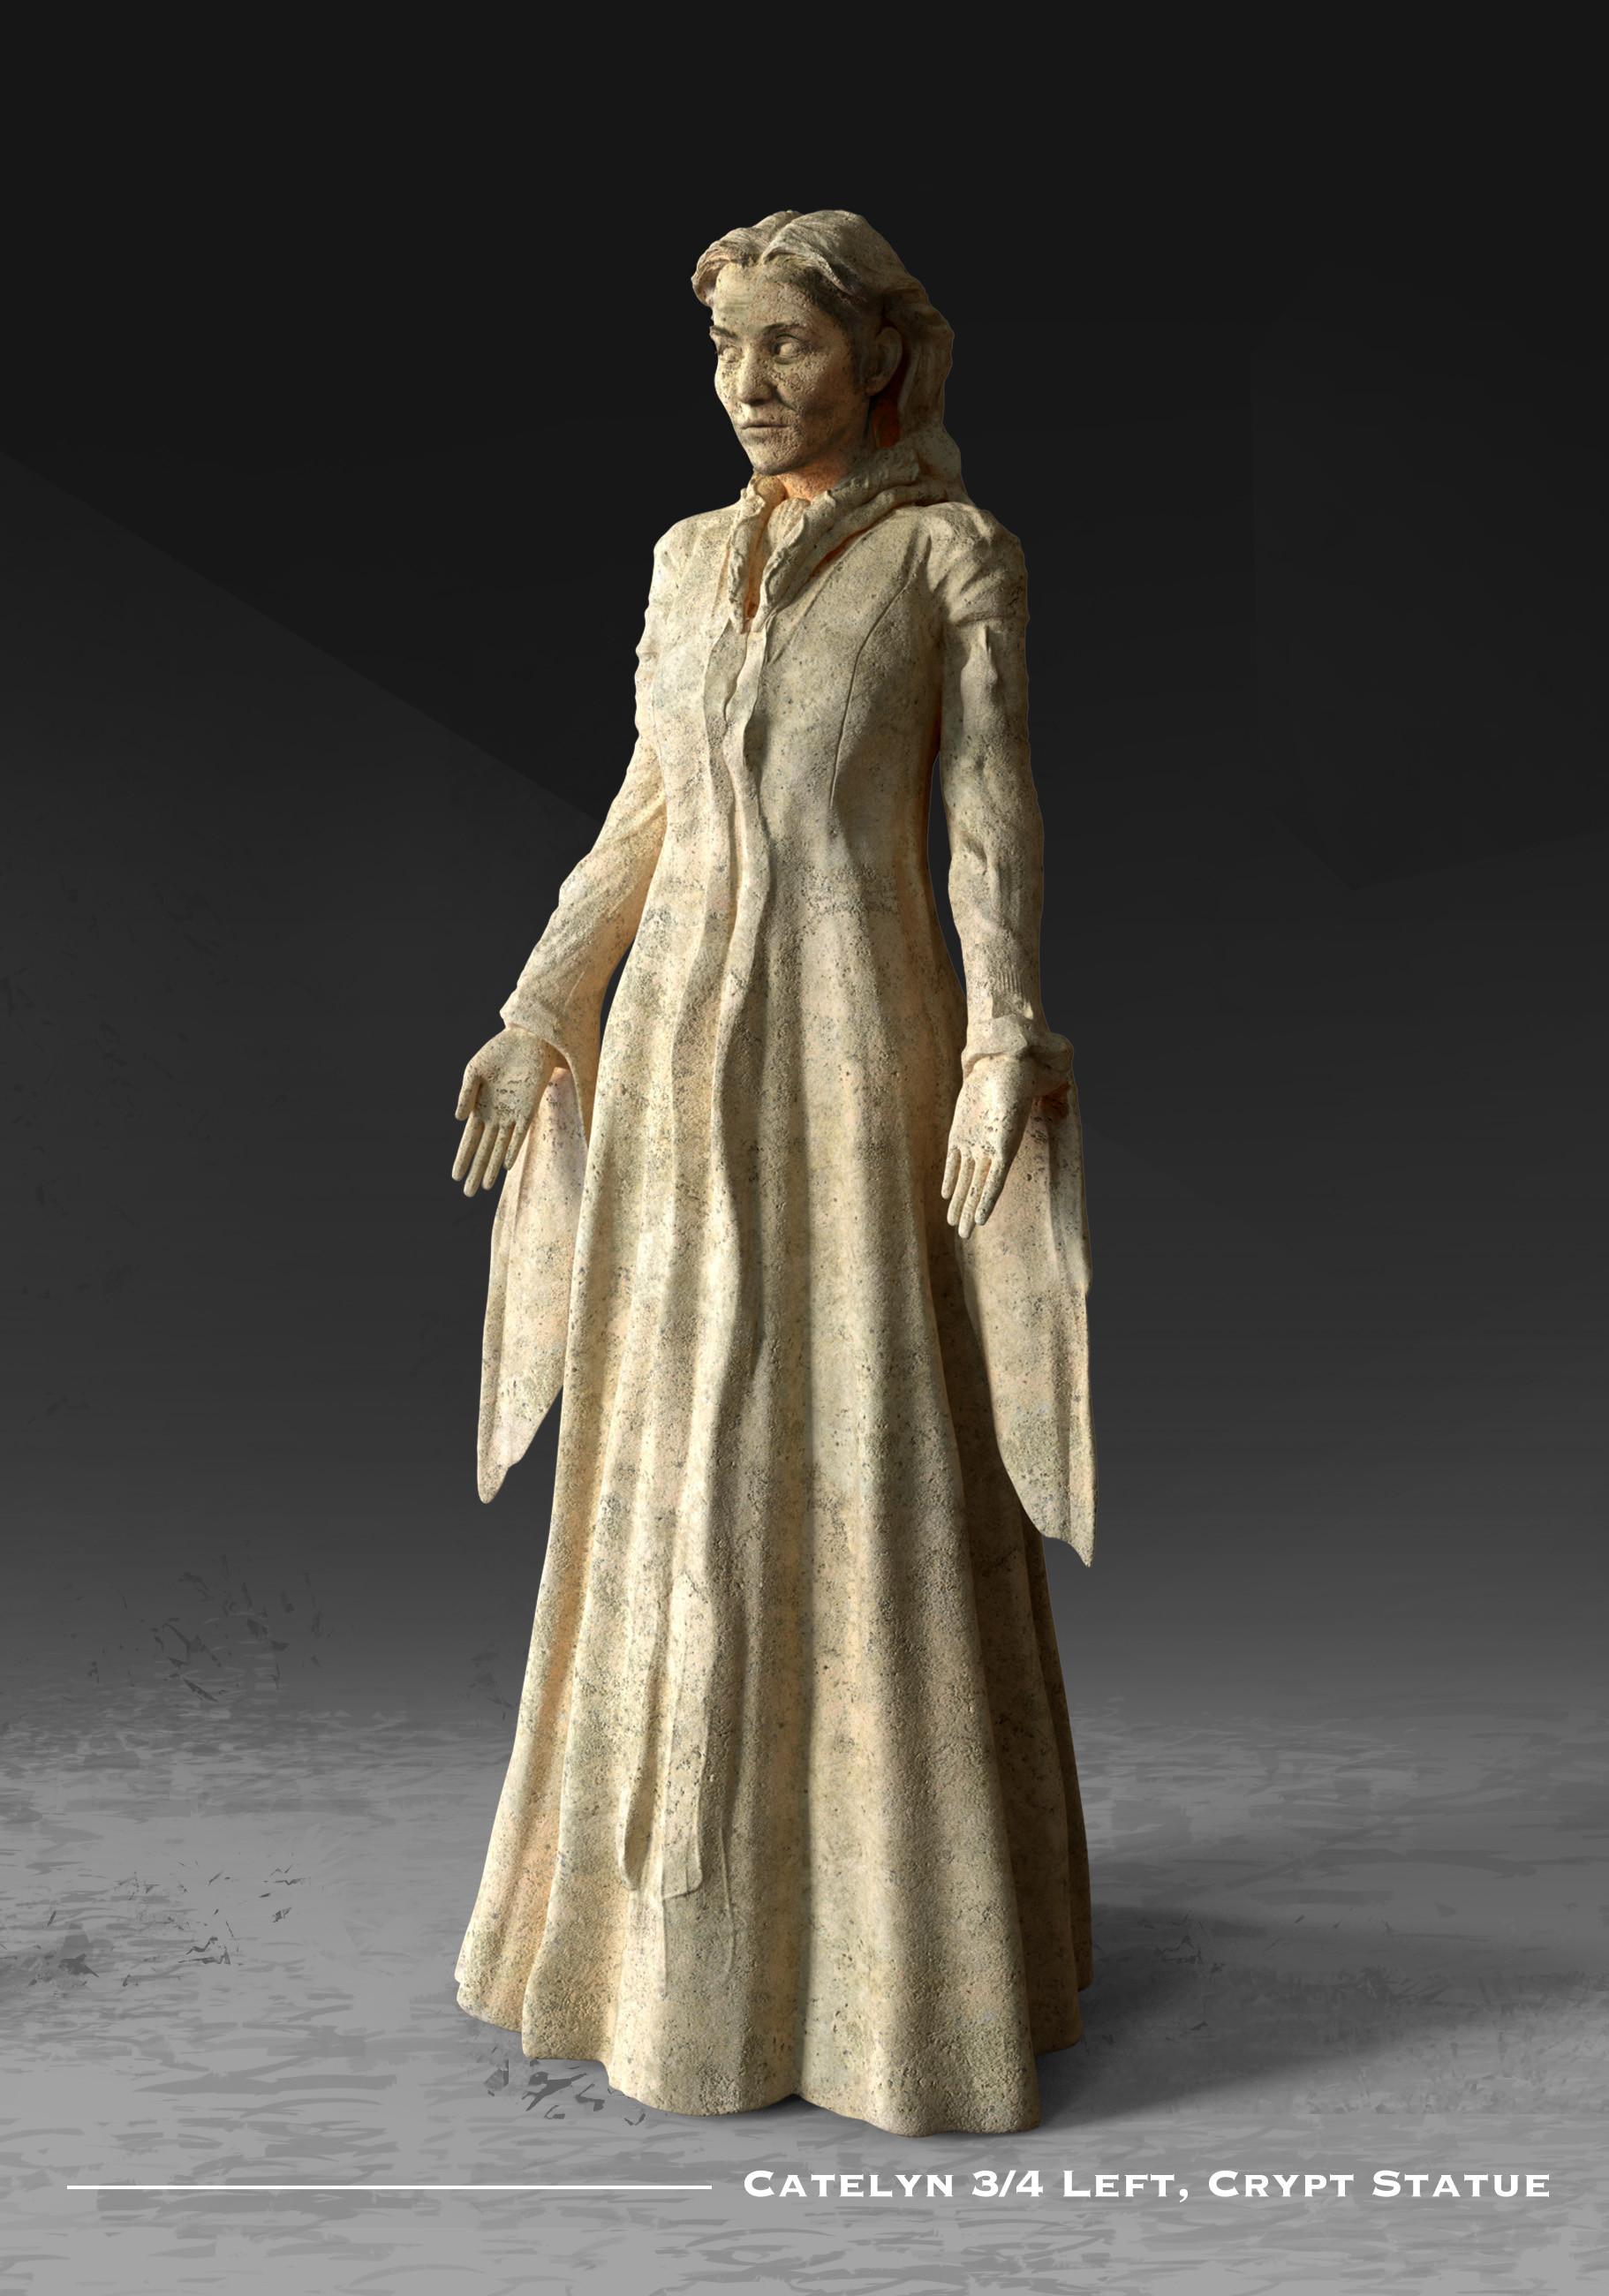 Kieran belshaw catelyn statue 3quarterleft v002